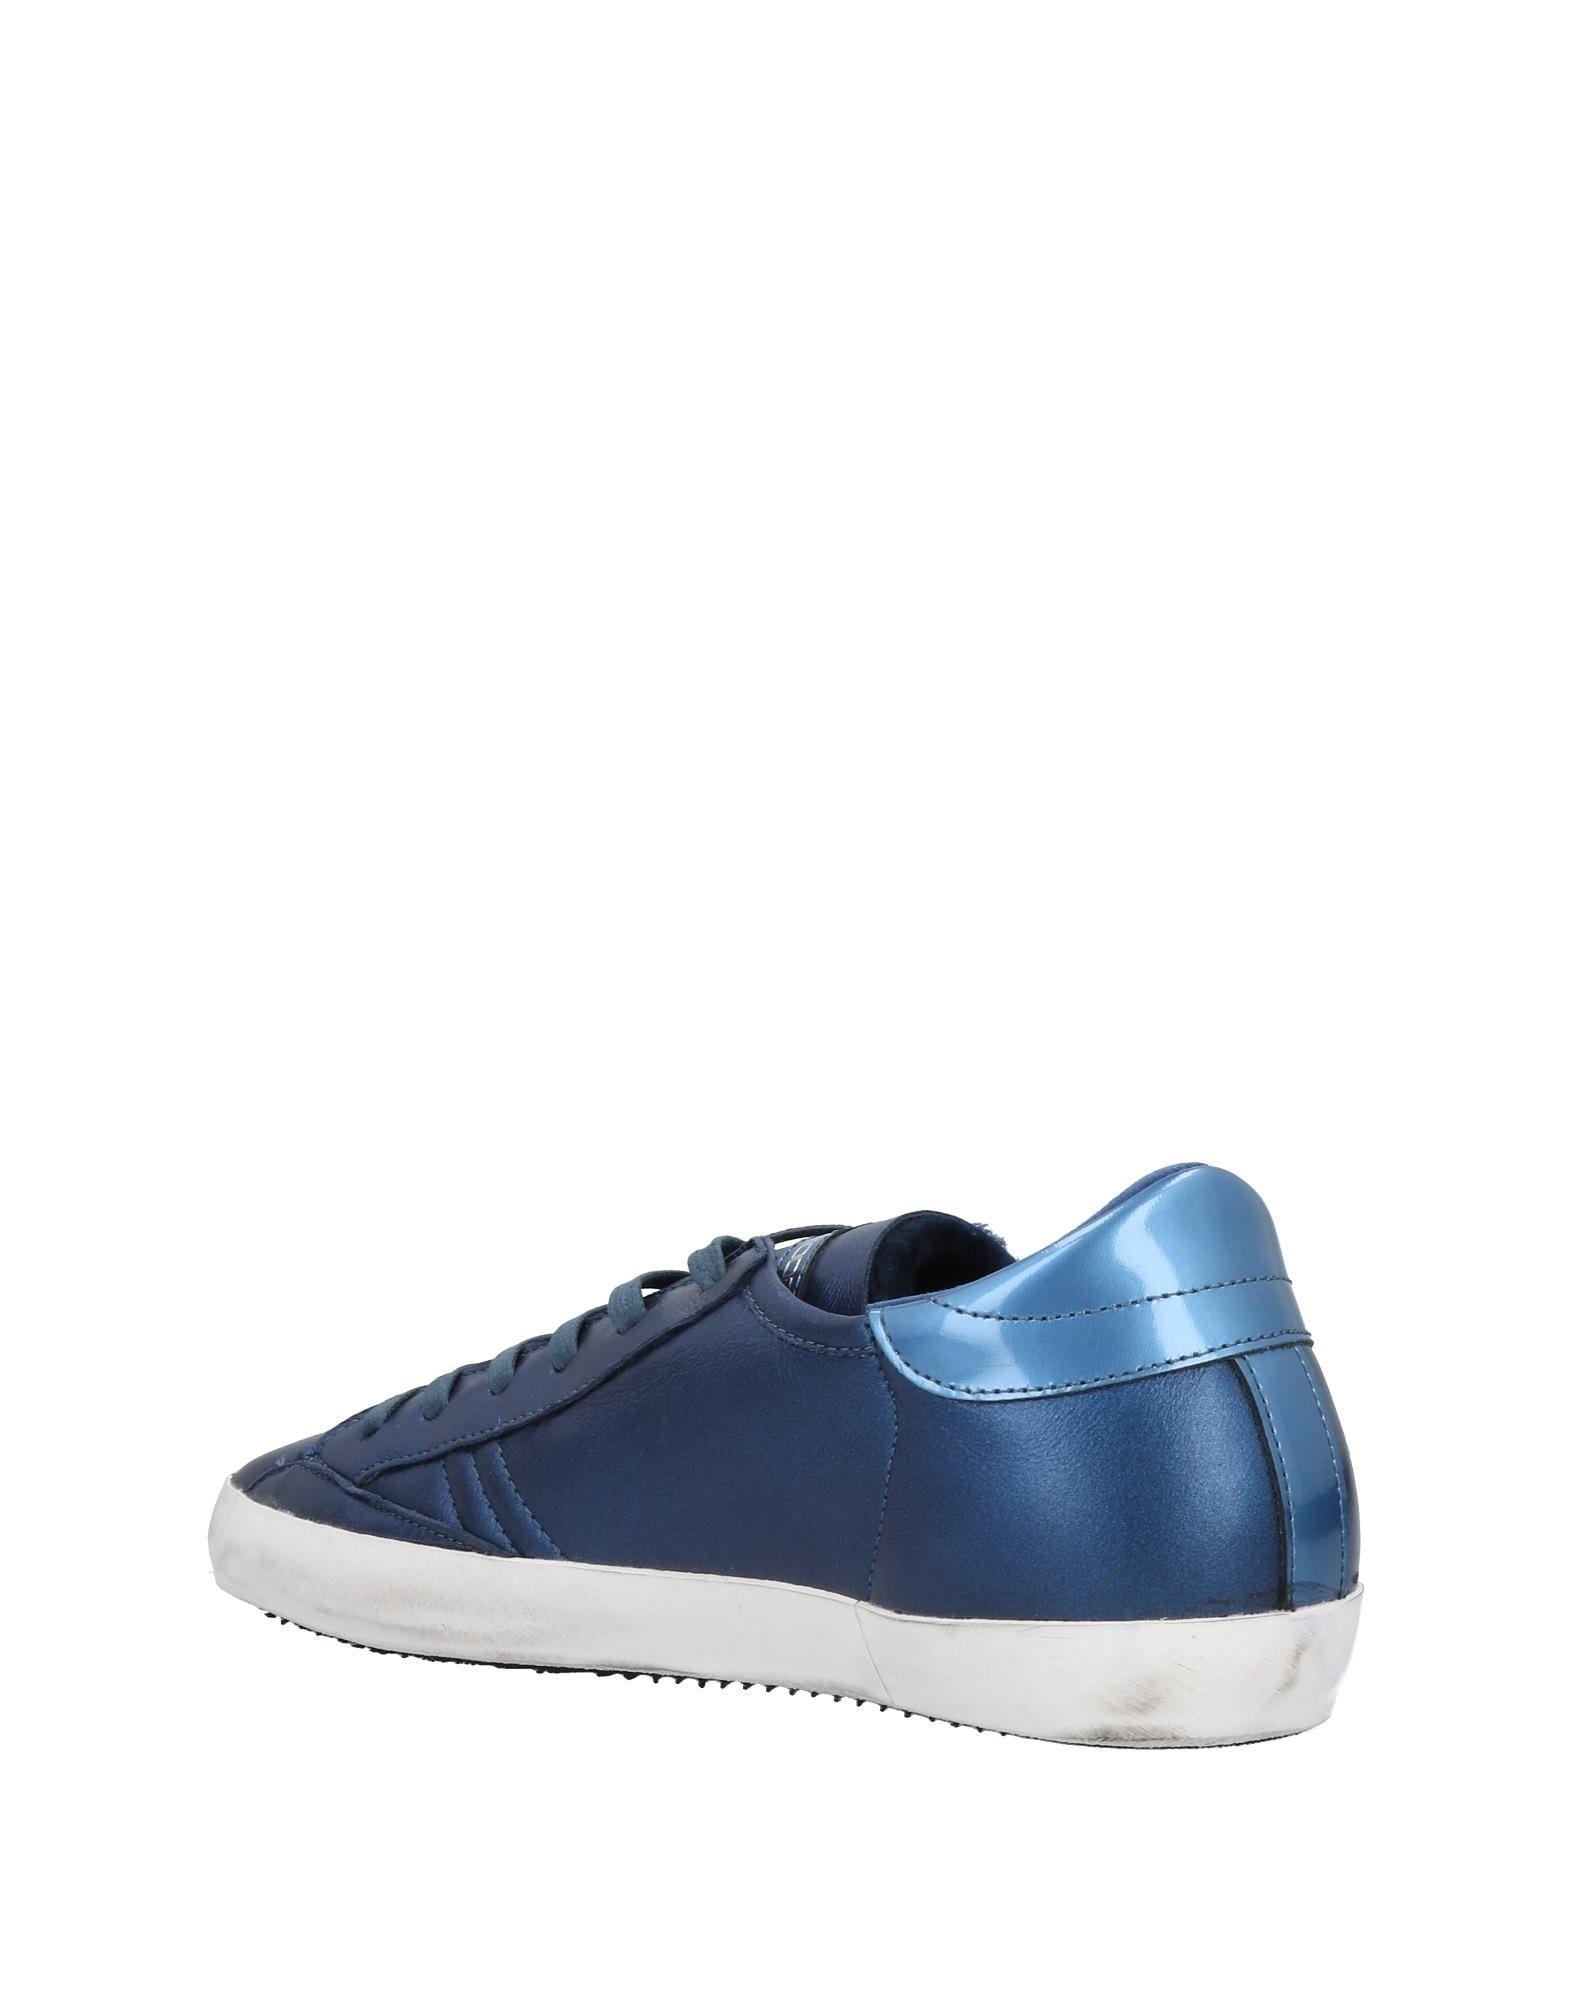 Philippe Model Sneakers Damen  11463675SJGut aussehende strapazierfähige Schuhe Schuhe strapazierfähige aee213